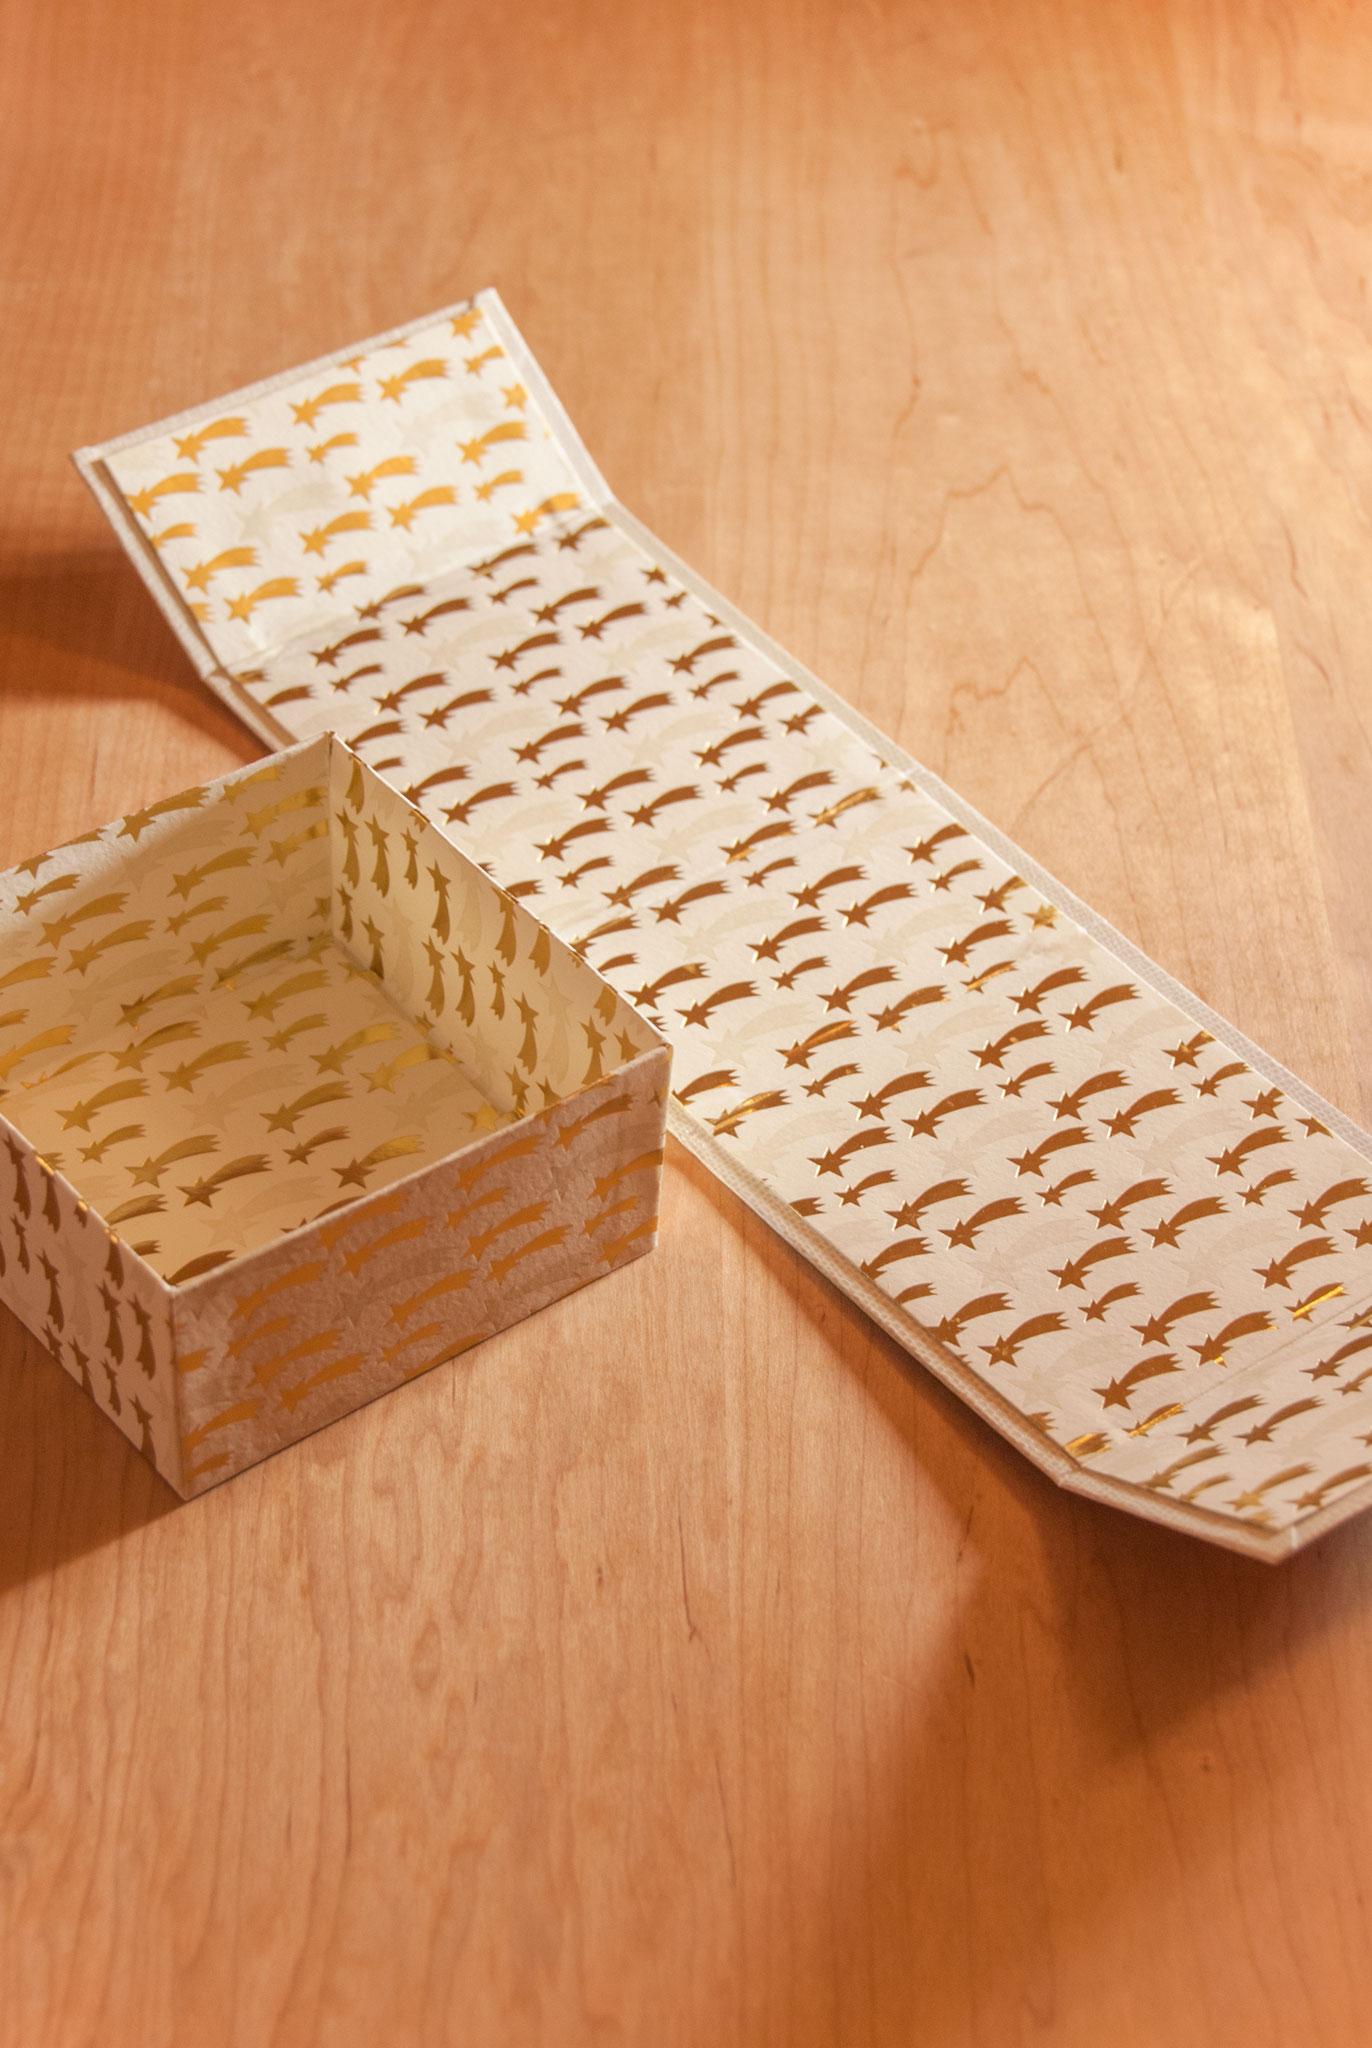 S(9.5-5) box with magnet, full lining, Fleur*Fleur*, fleurfleur